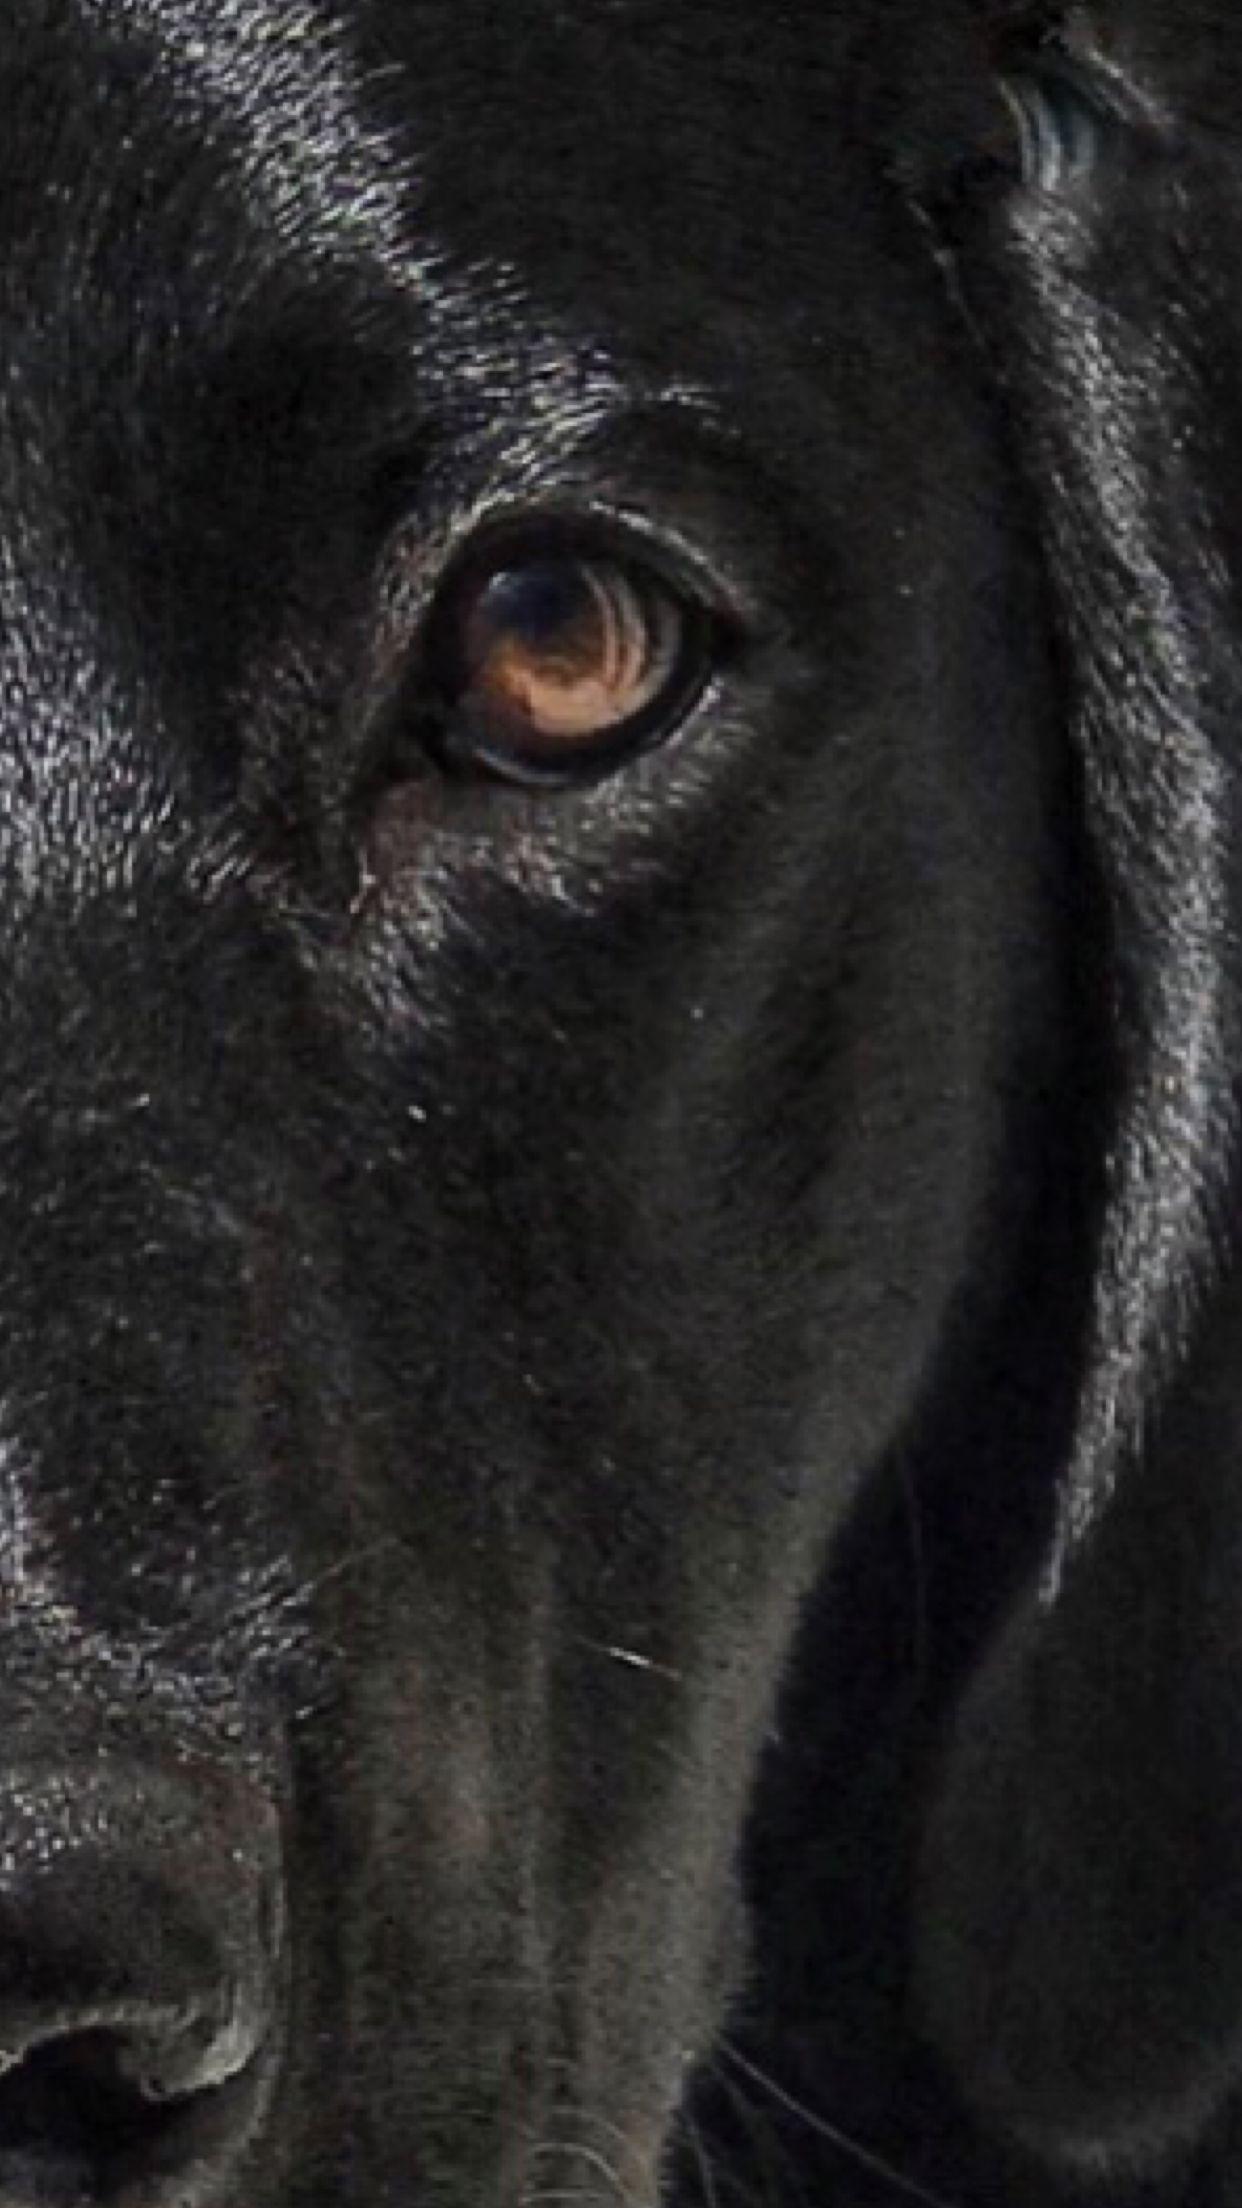 Jole Blon ️ blacklabs Black dog, Black labs, Dogs